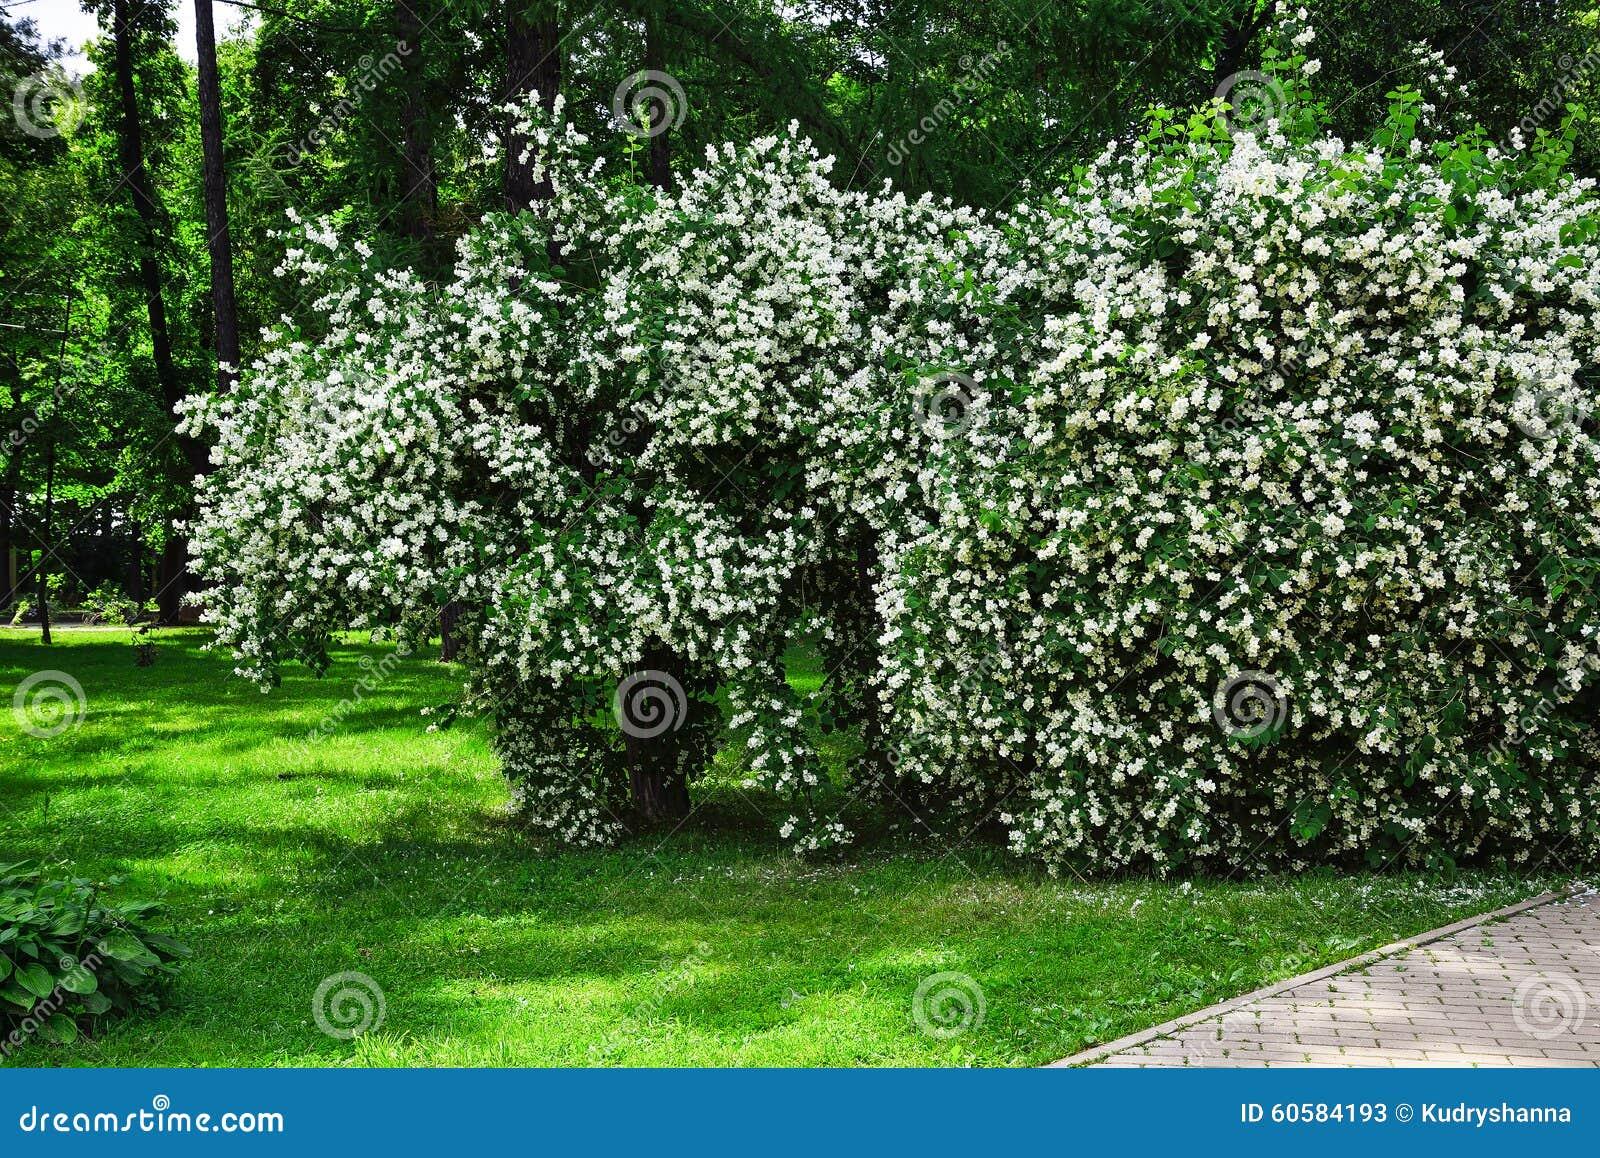 Arbusto Fiori Bianchi.Shrub With White Flowers Stock Image Image Of Season 60584193